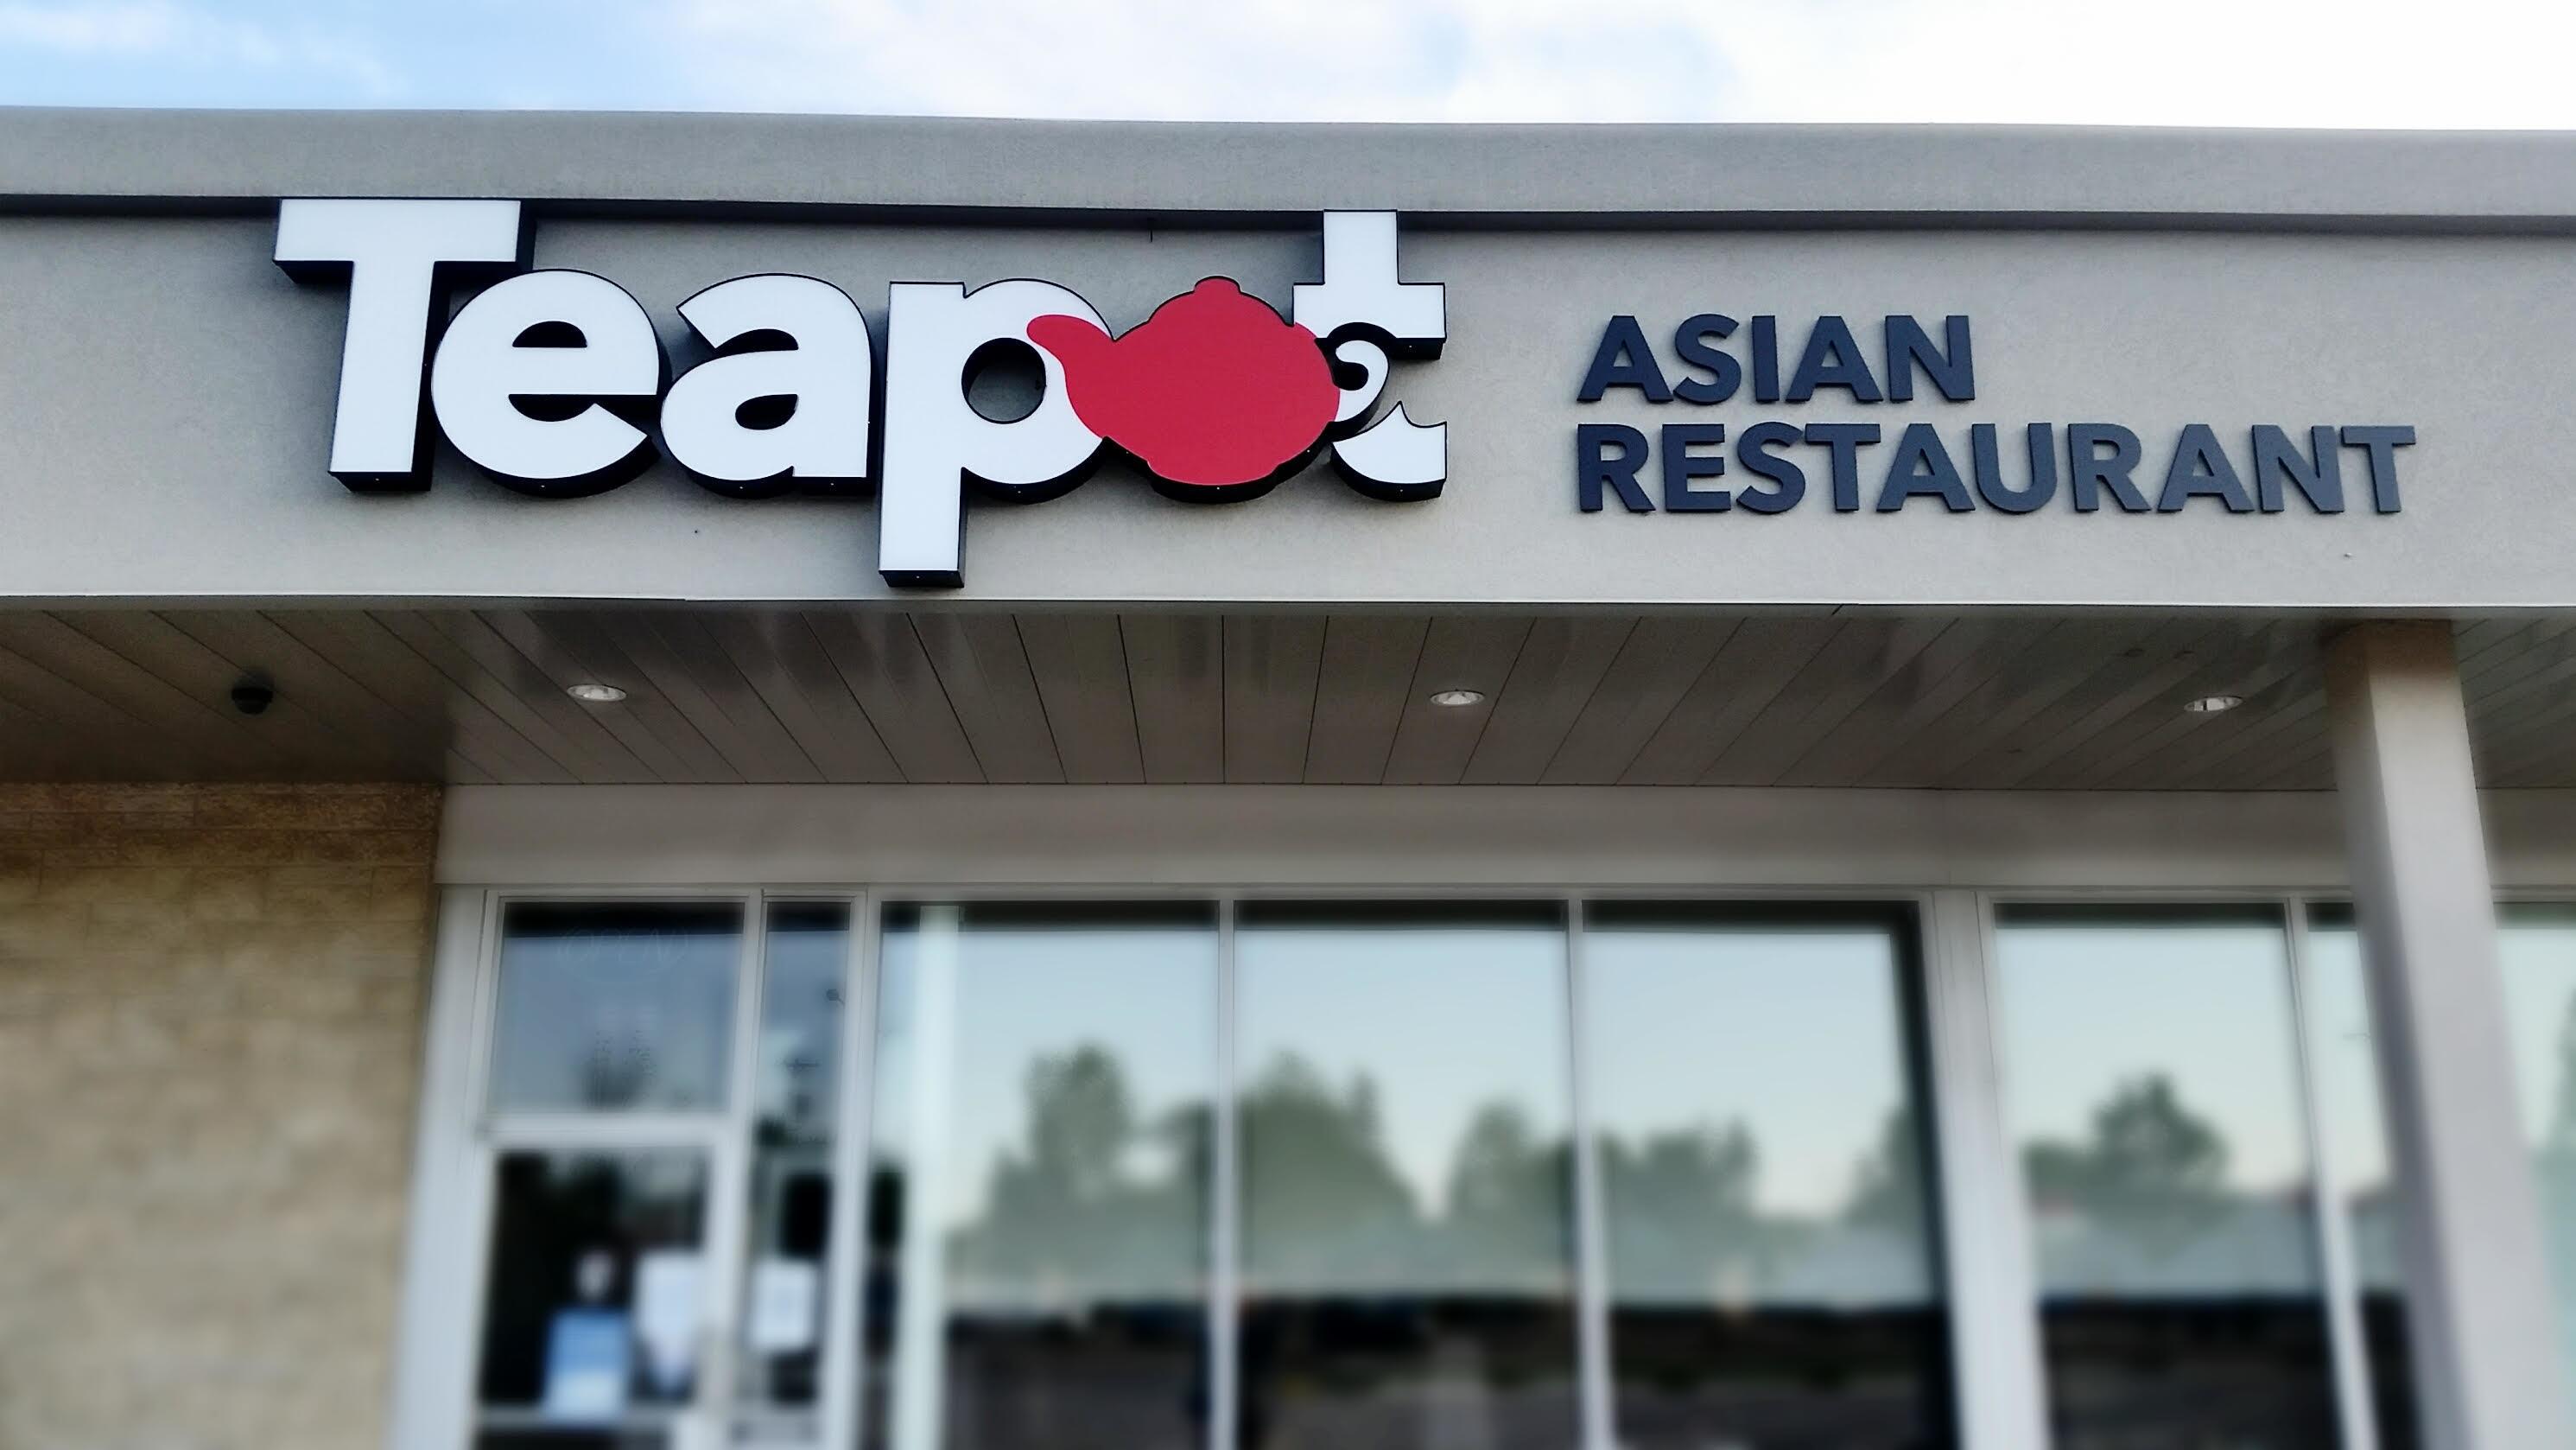 Teapot Restaurant Saskatoon Menu